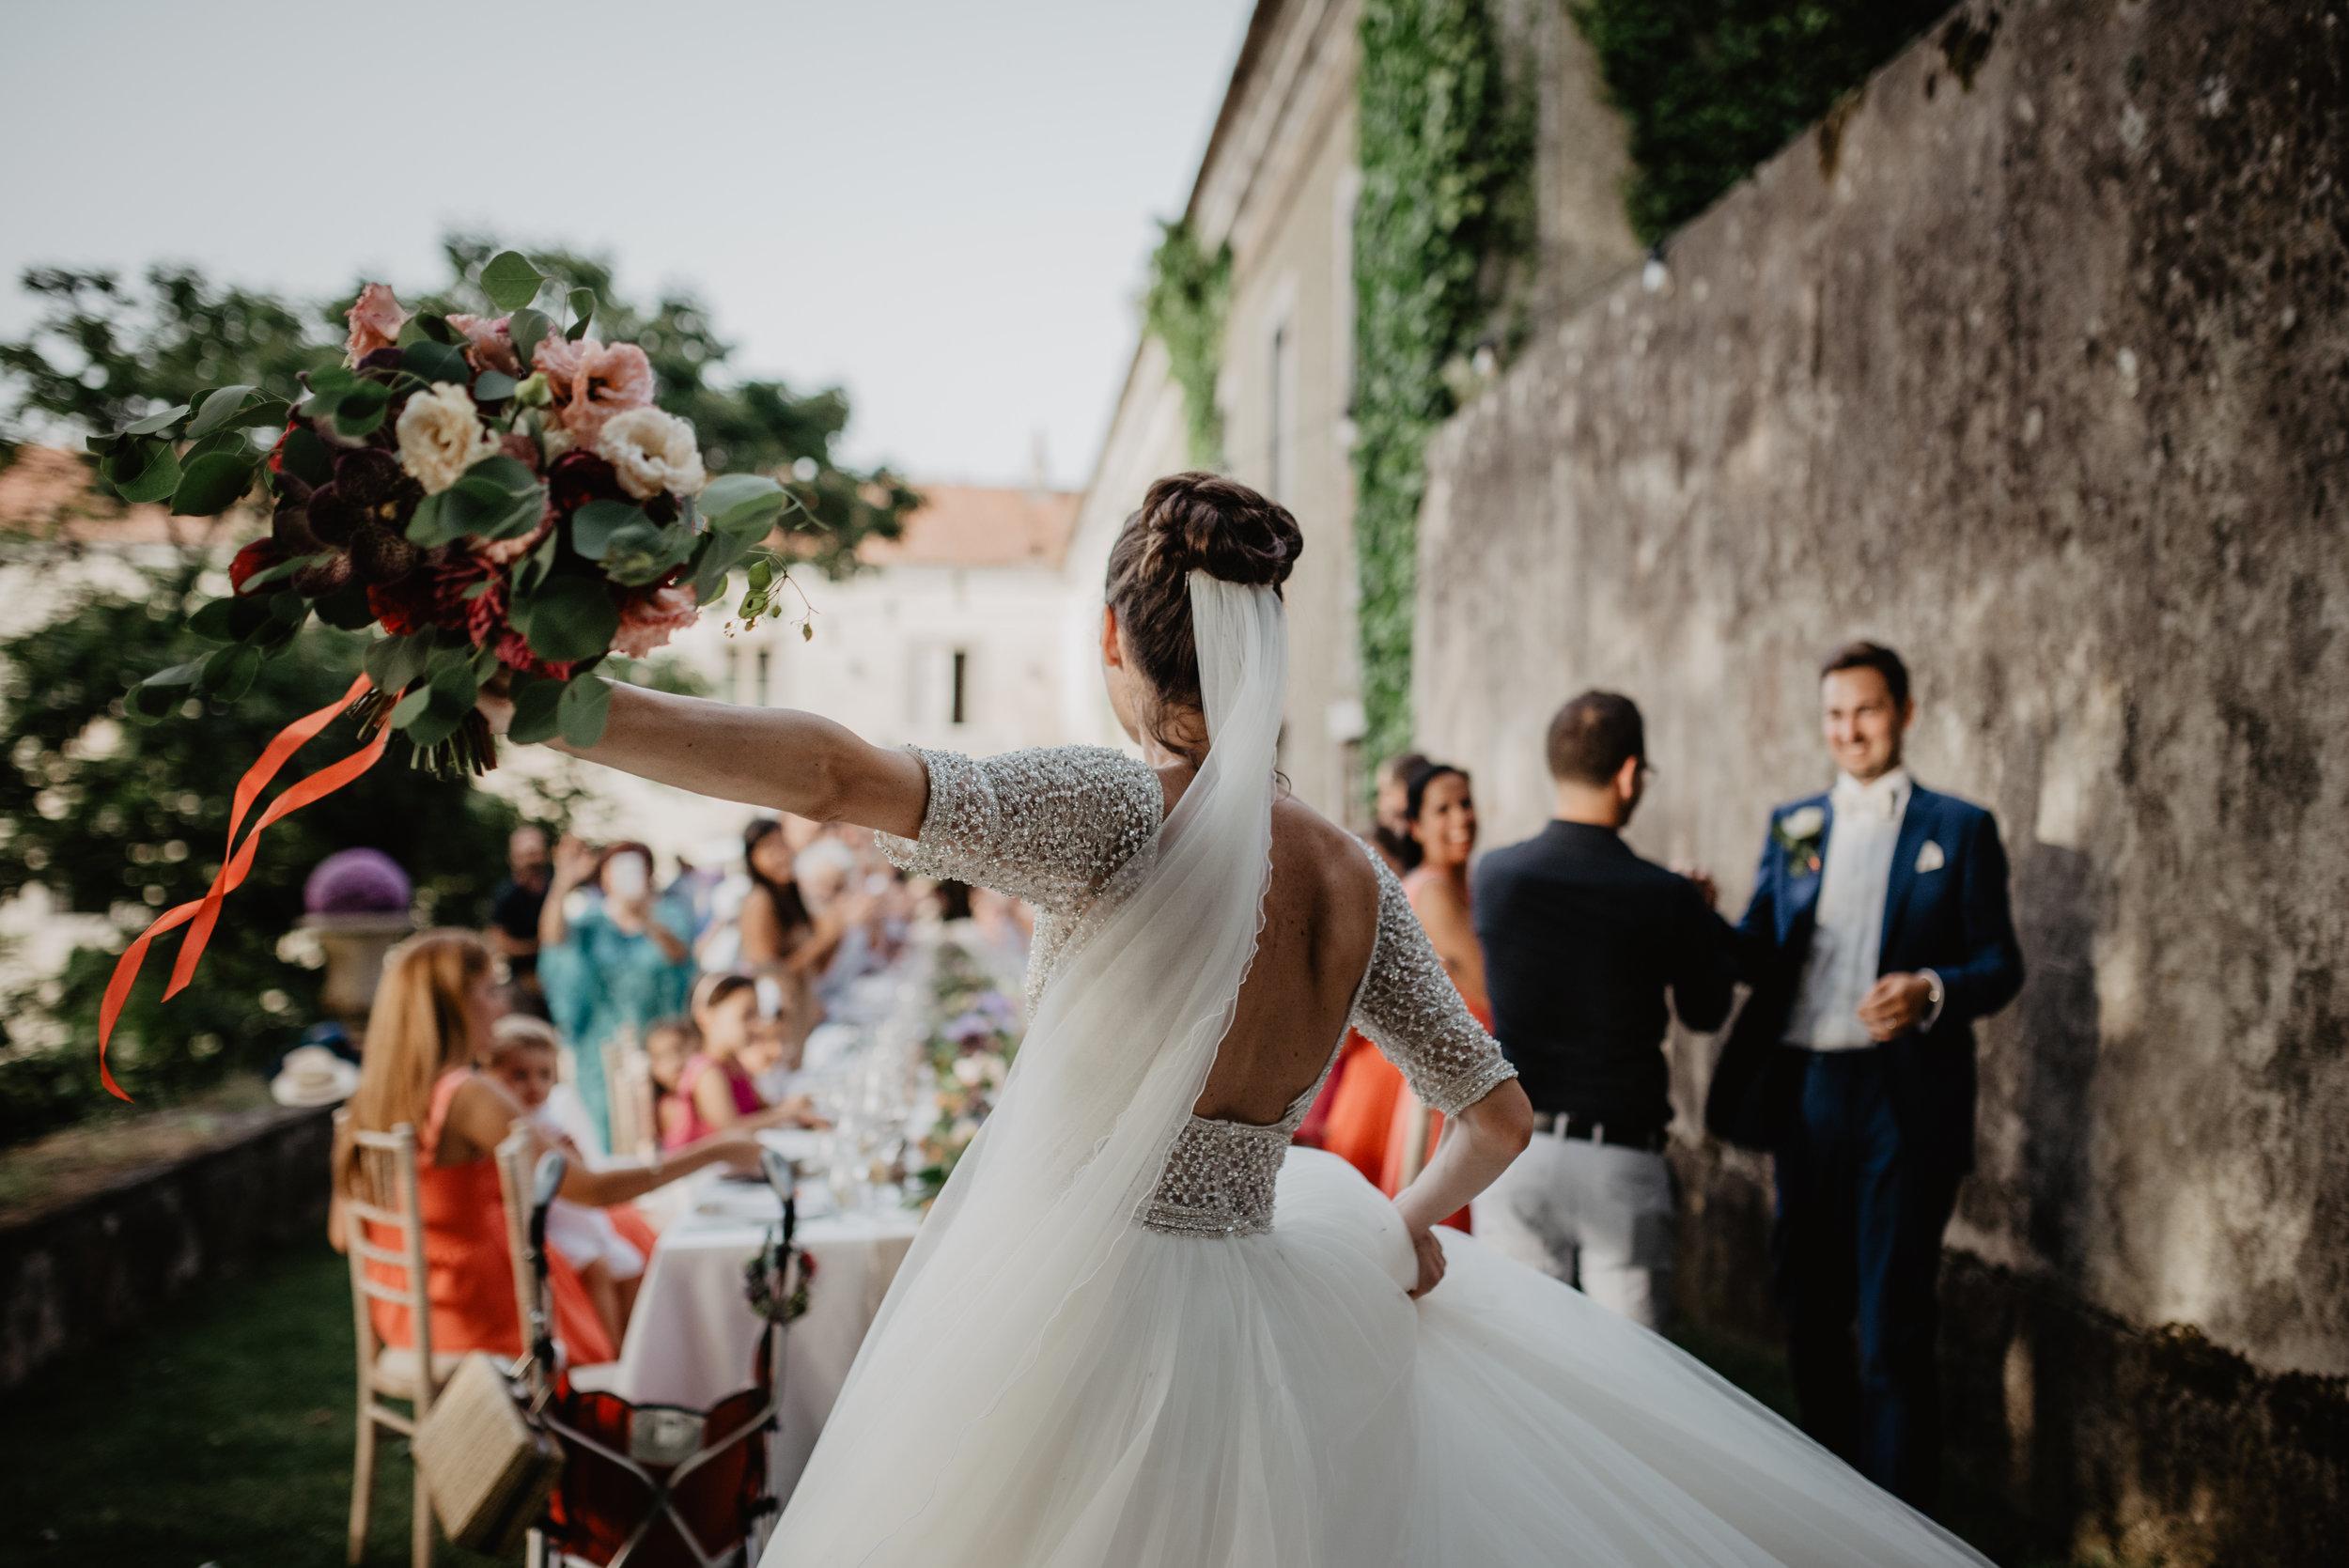 Lapela-photography-wedding-sintra-portugal-108.jpg